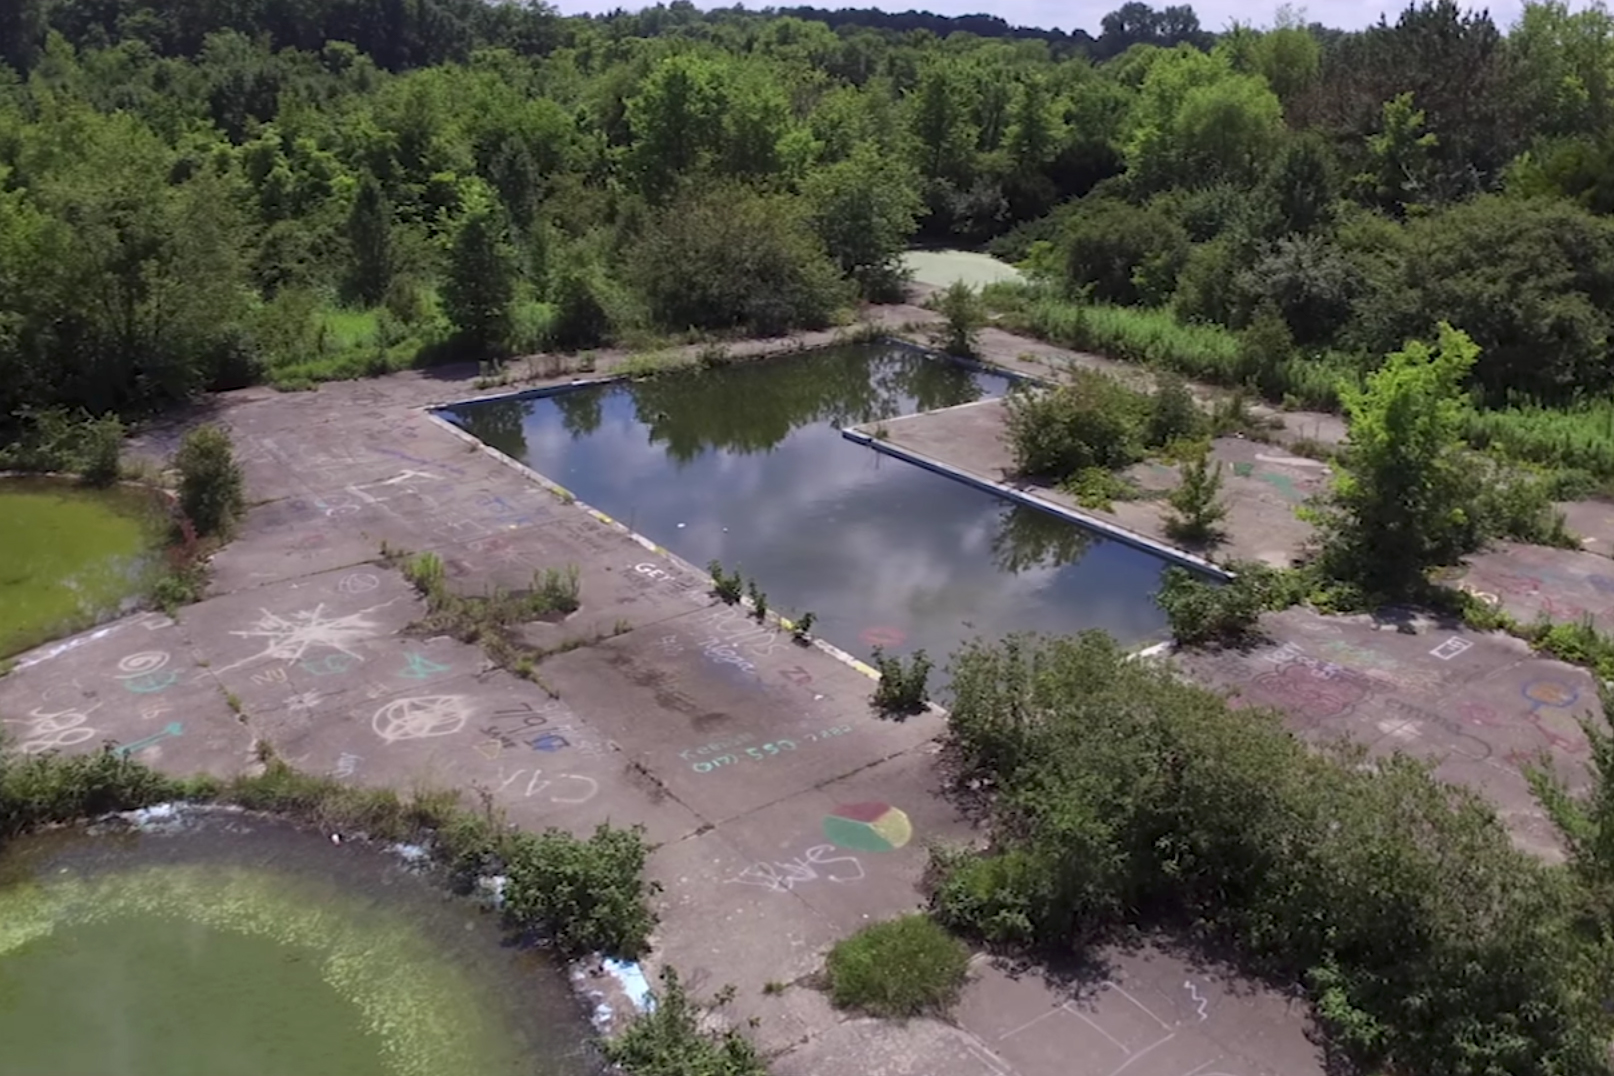 Thunder Island water park drone photo